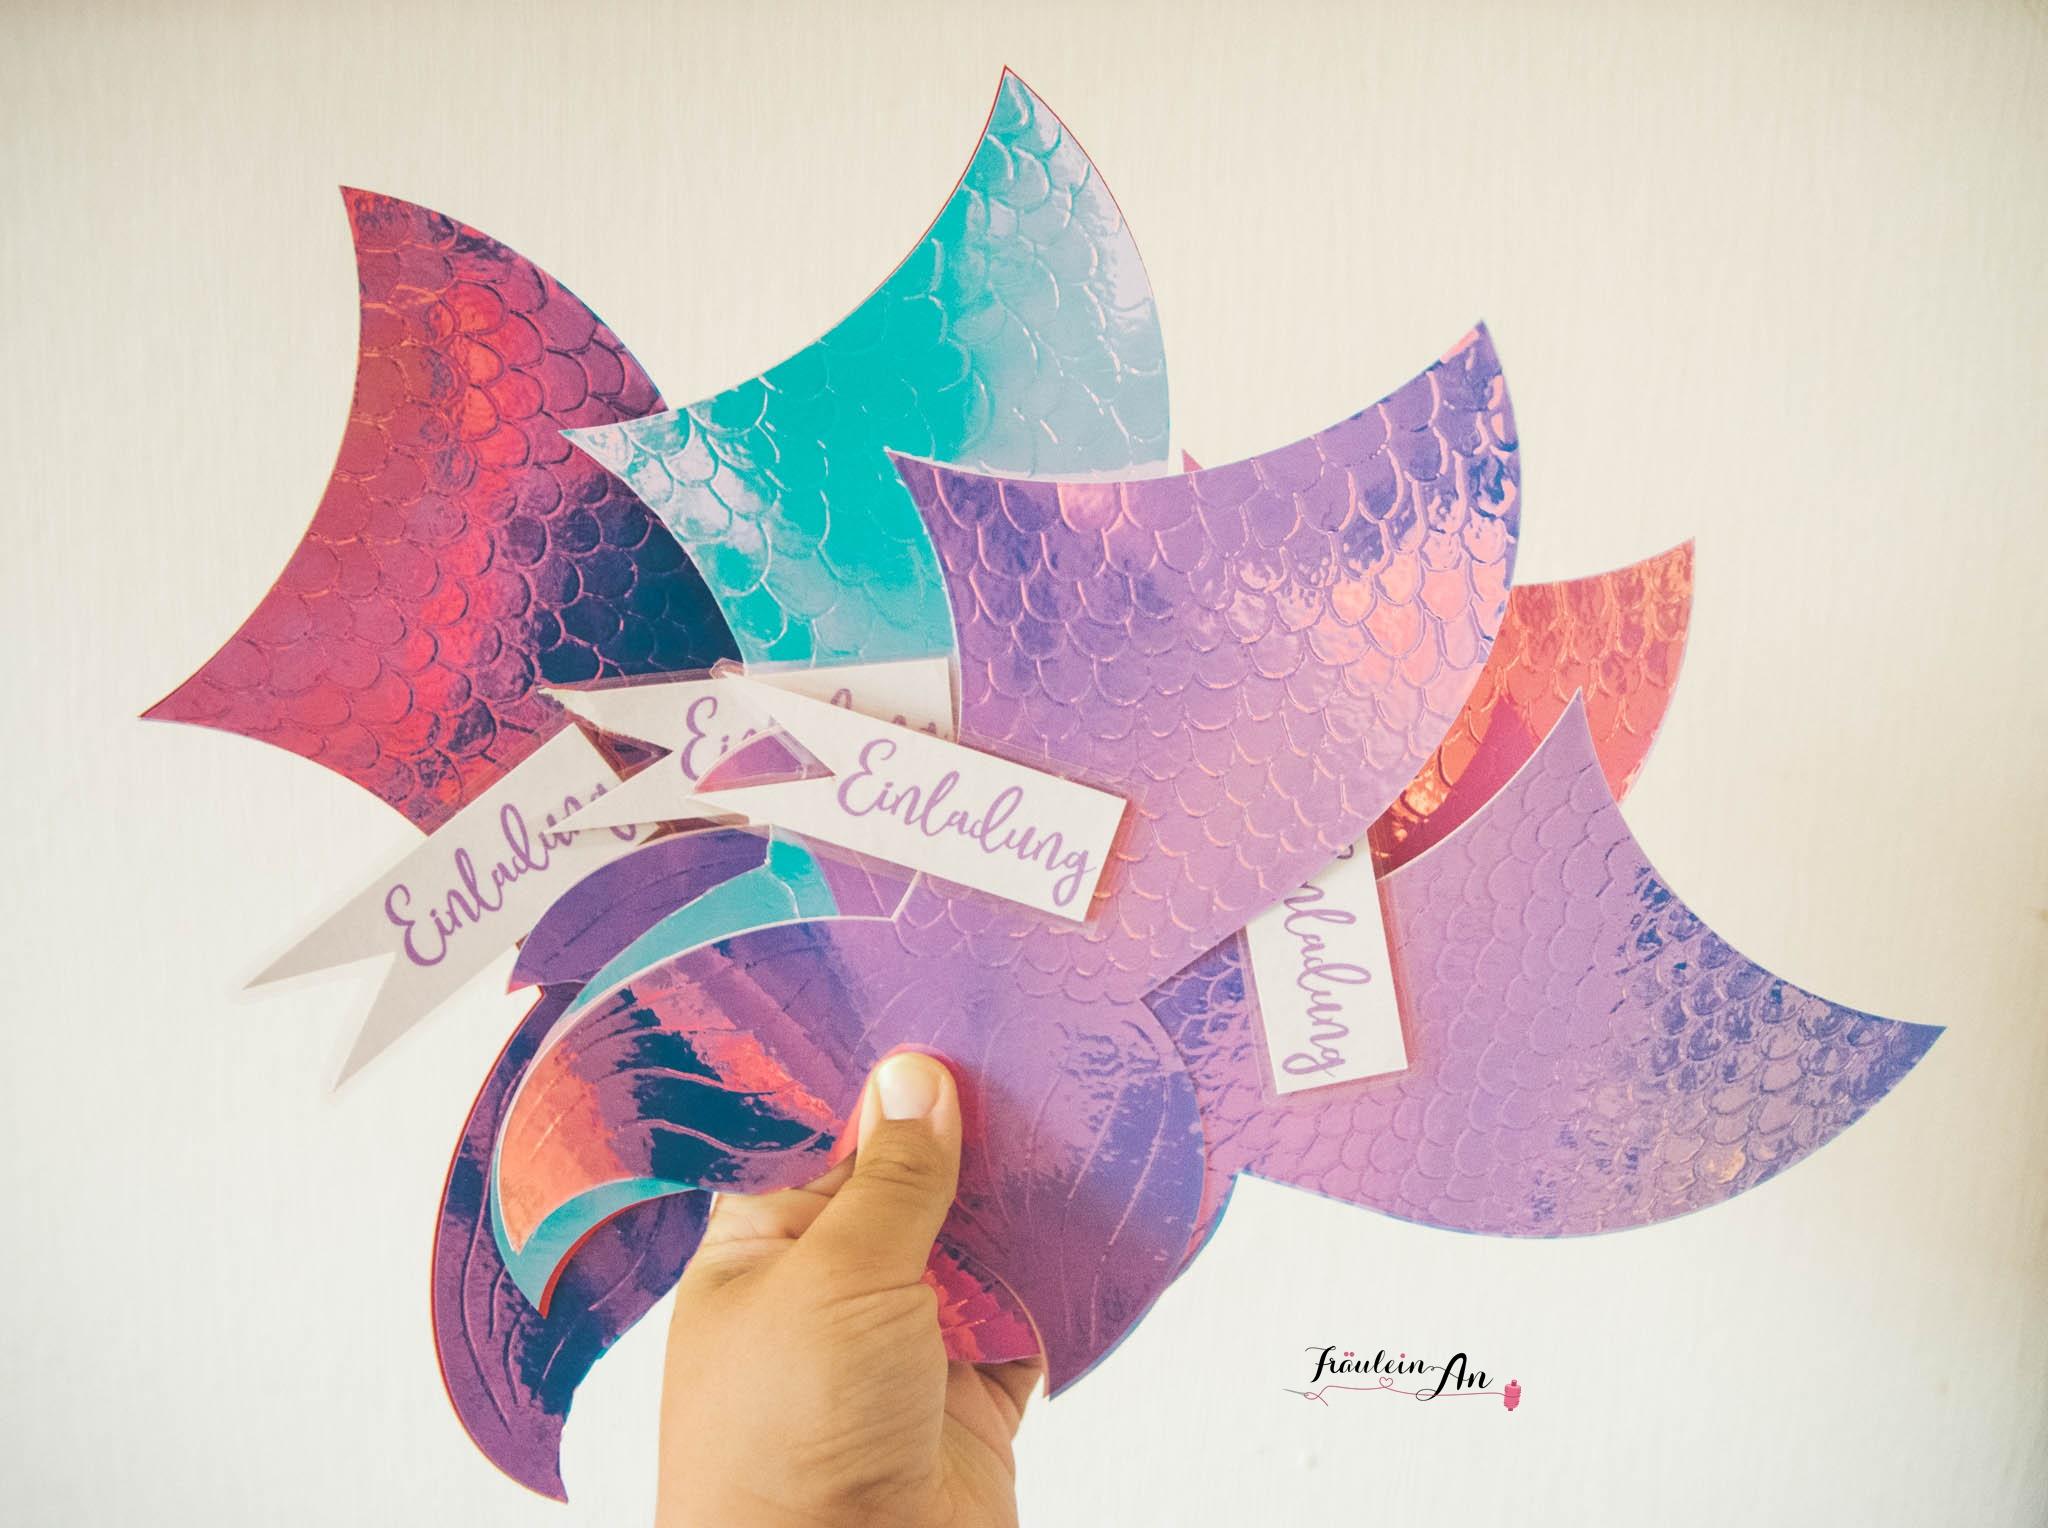 Cricut Maker: Meerjungsfrauen Einladungskarte